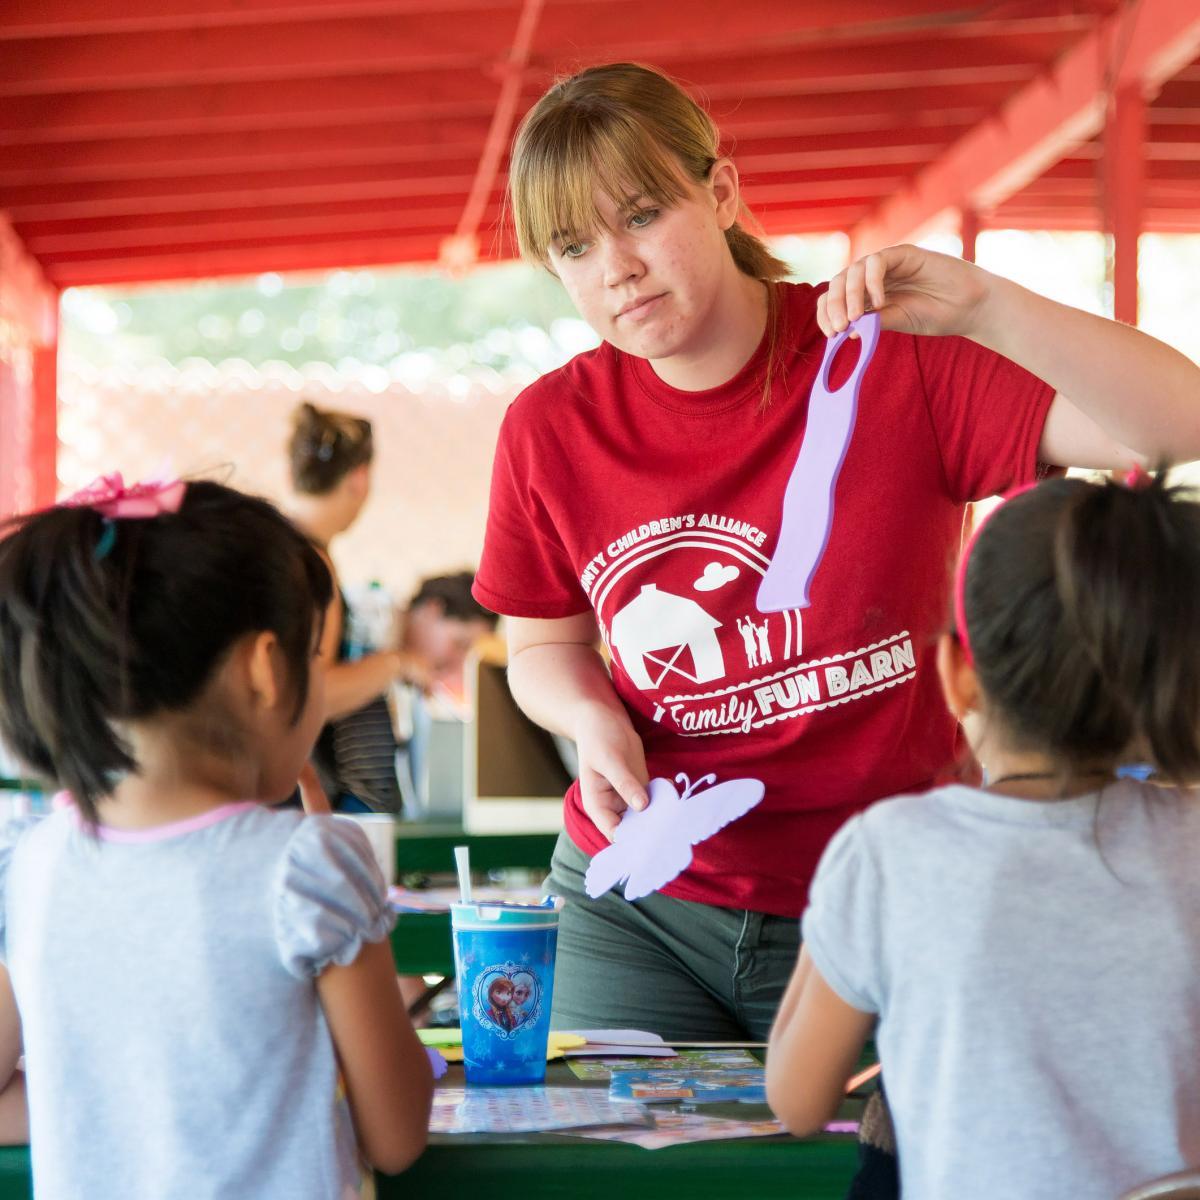 Photo Gallery - Yolo County Children's Alliance